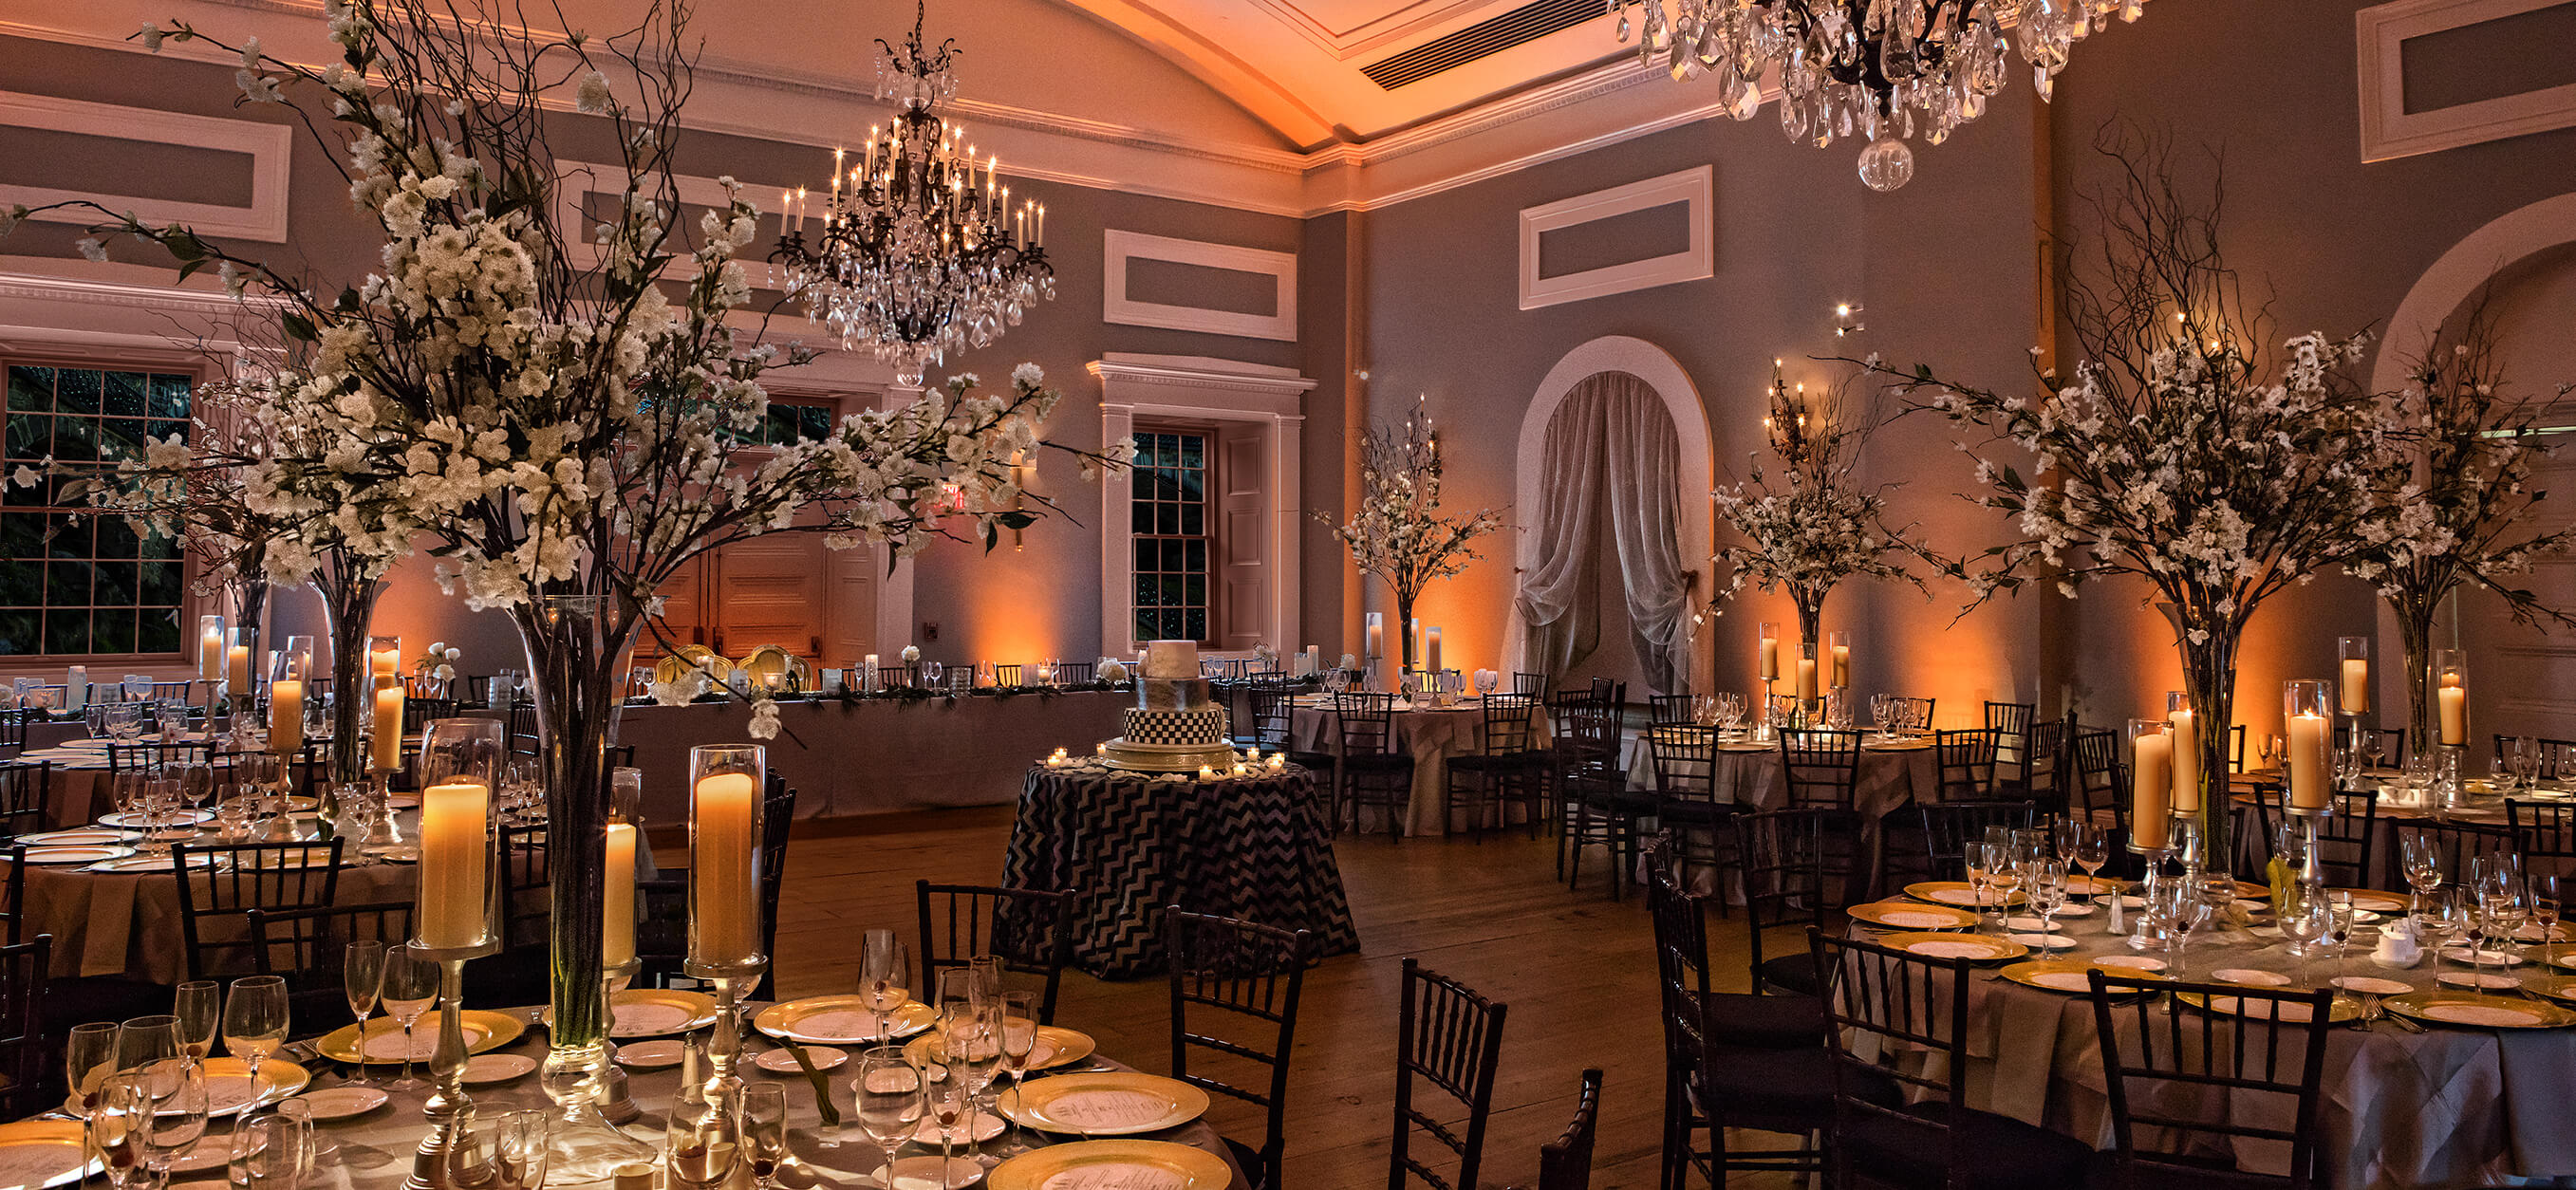 Water Works Cescaphe Weddings Philadelphia Wedding Services